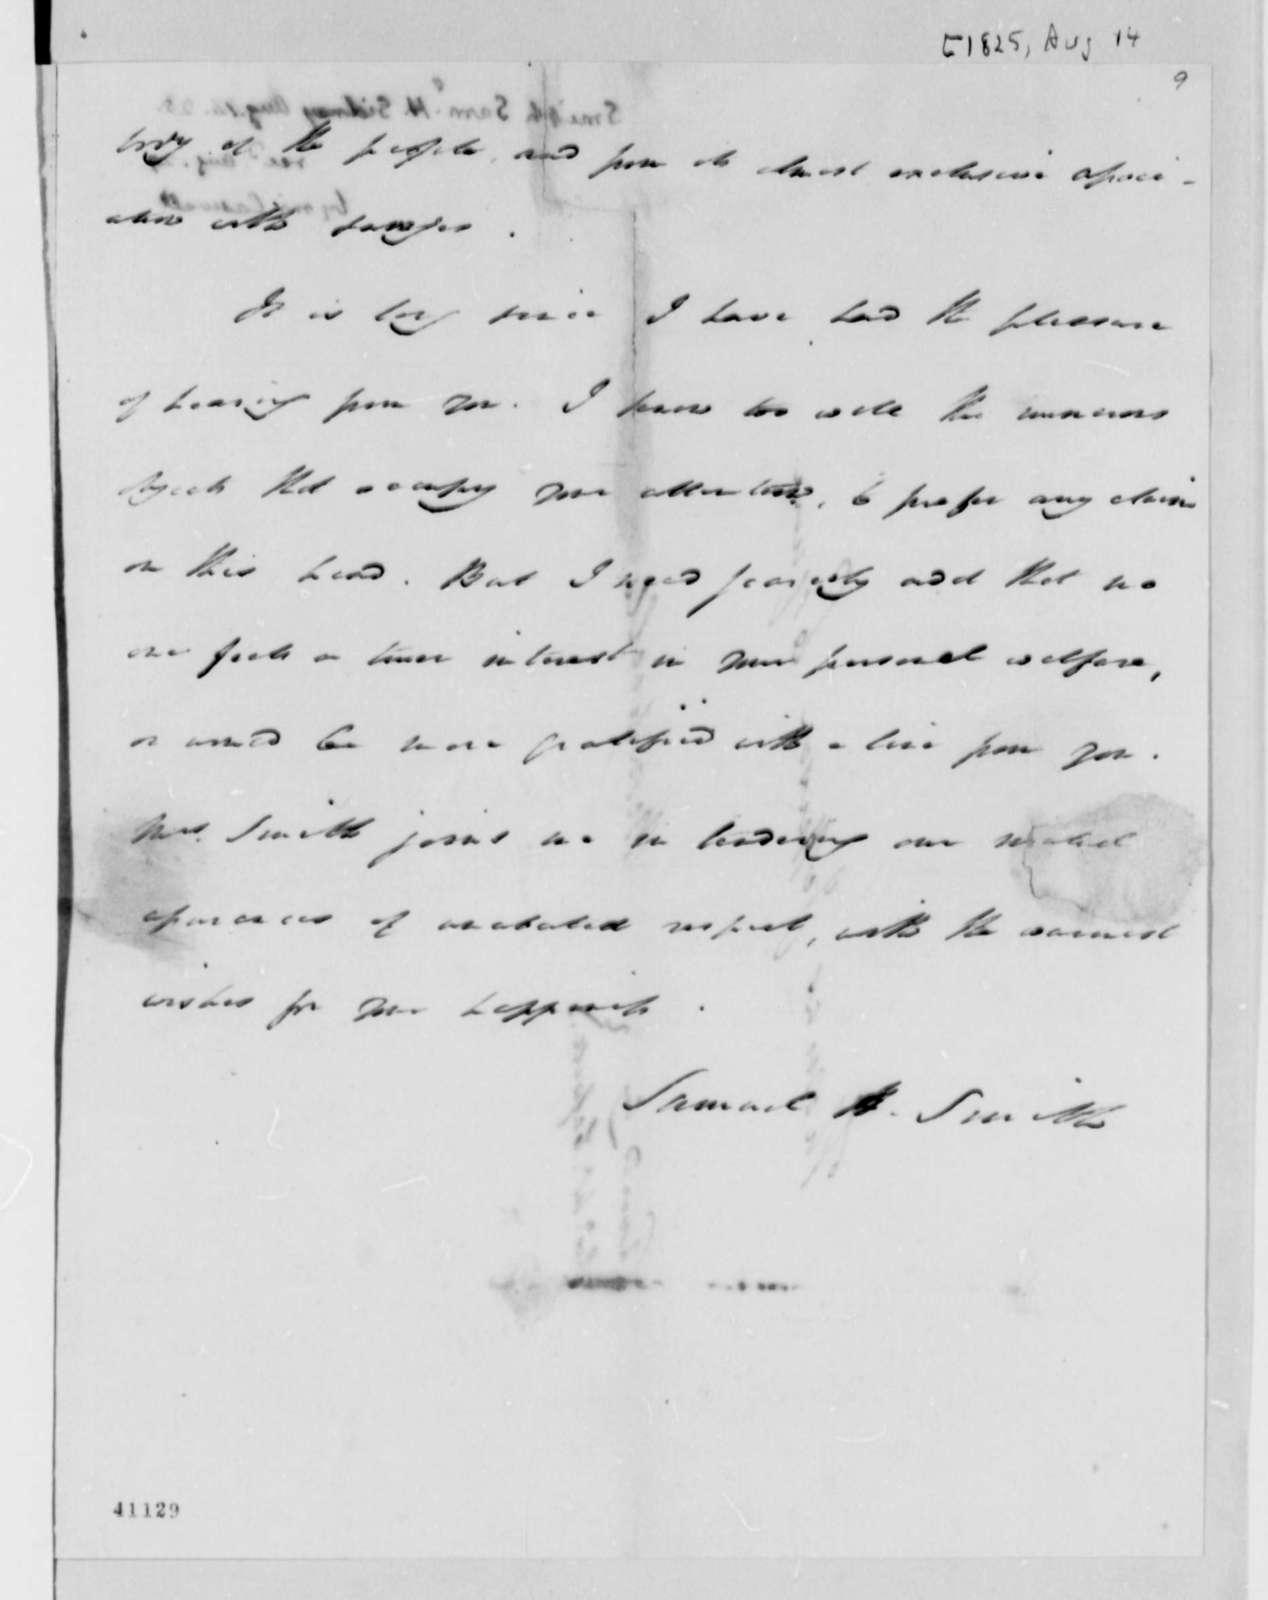 Samuel H. Smith to Thomas Jefferson, August 14, 1825